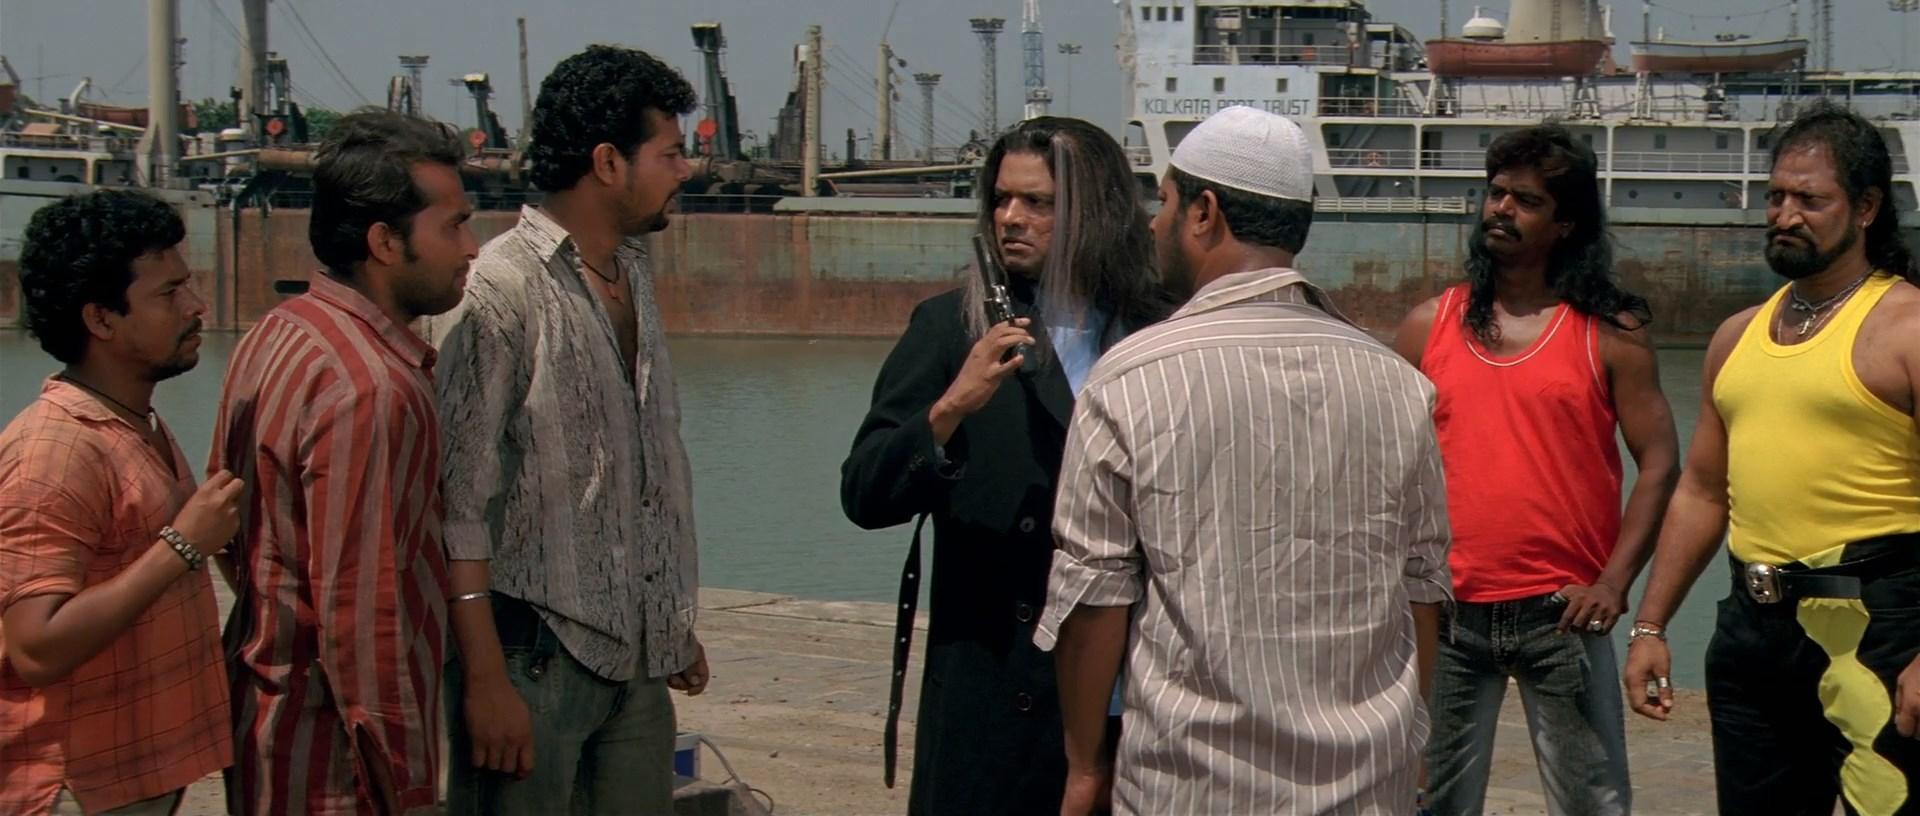 Refugee.2006.Bangali.1080p.WEB DL.H264.AAC.D0T.Telly.mkv snapshot 00.16.24.000